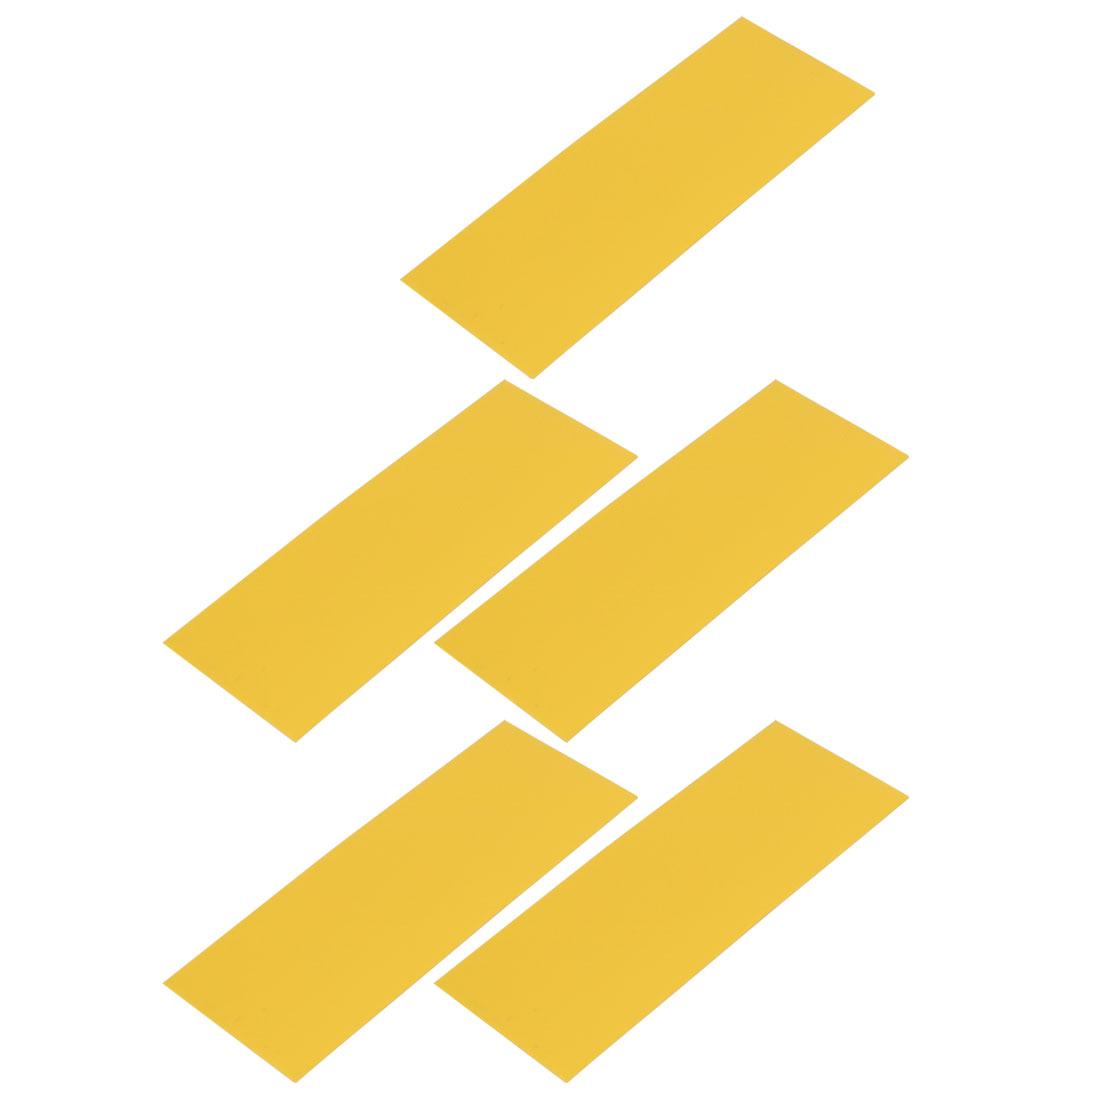 5pcs 17mm Flat Width 46mm Long PVC Heat Shrinkable Tube Yellow for AAA Battery